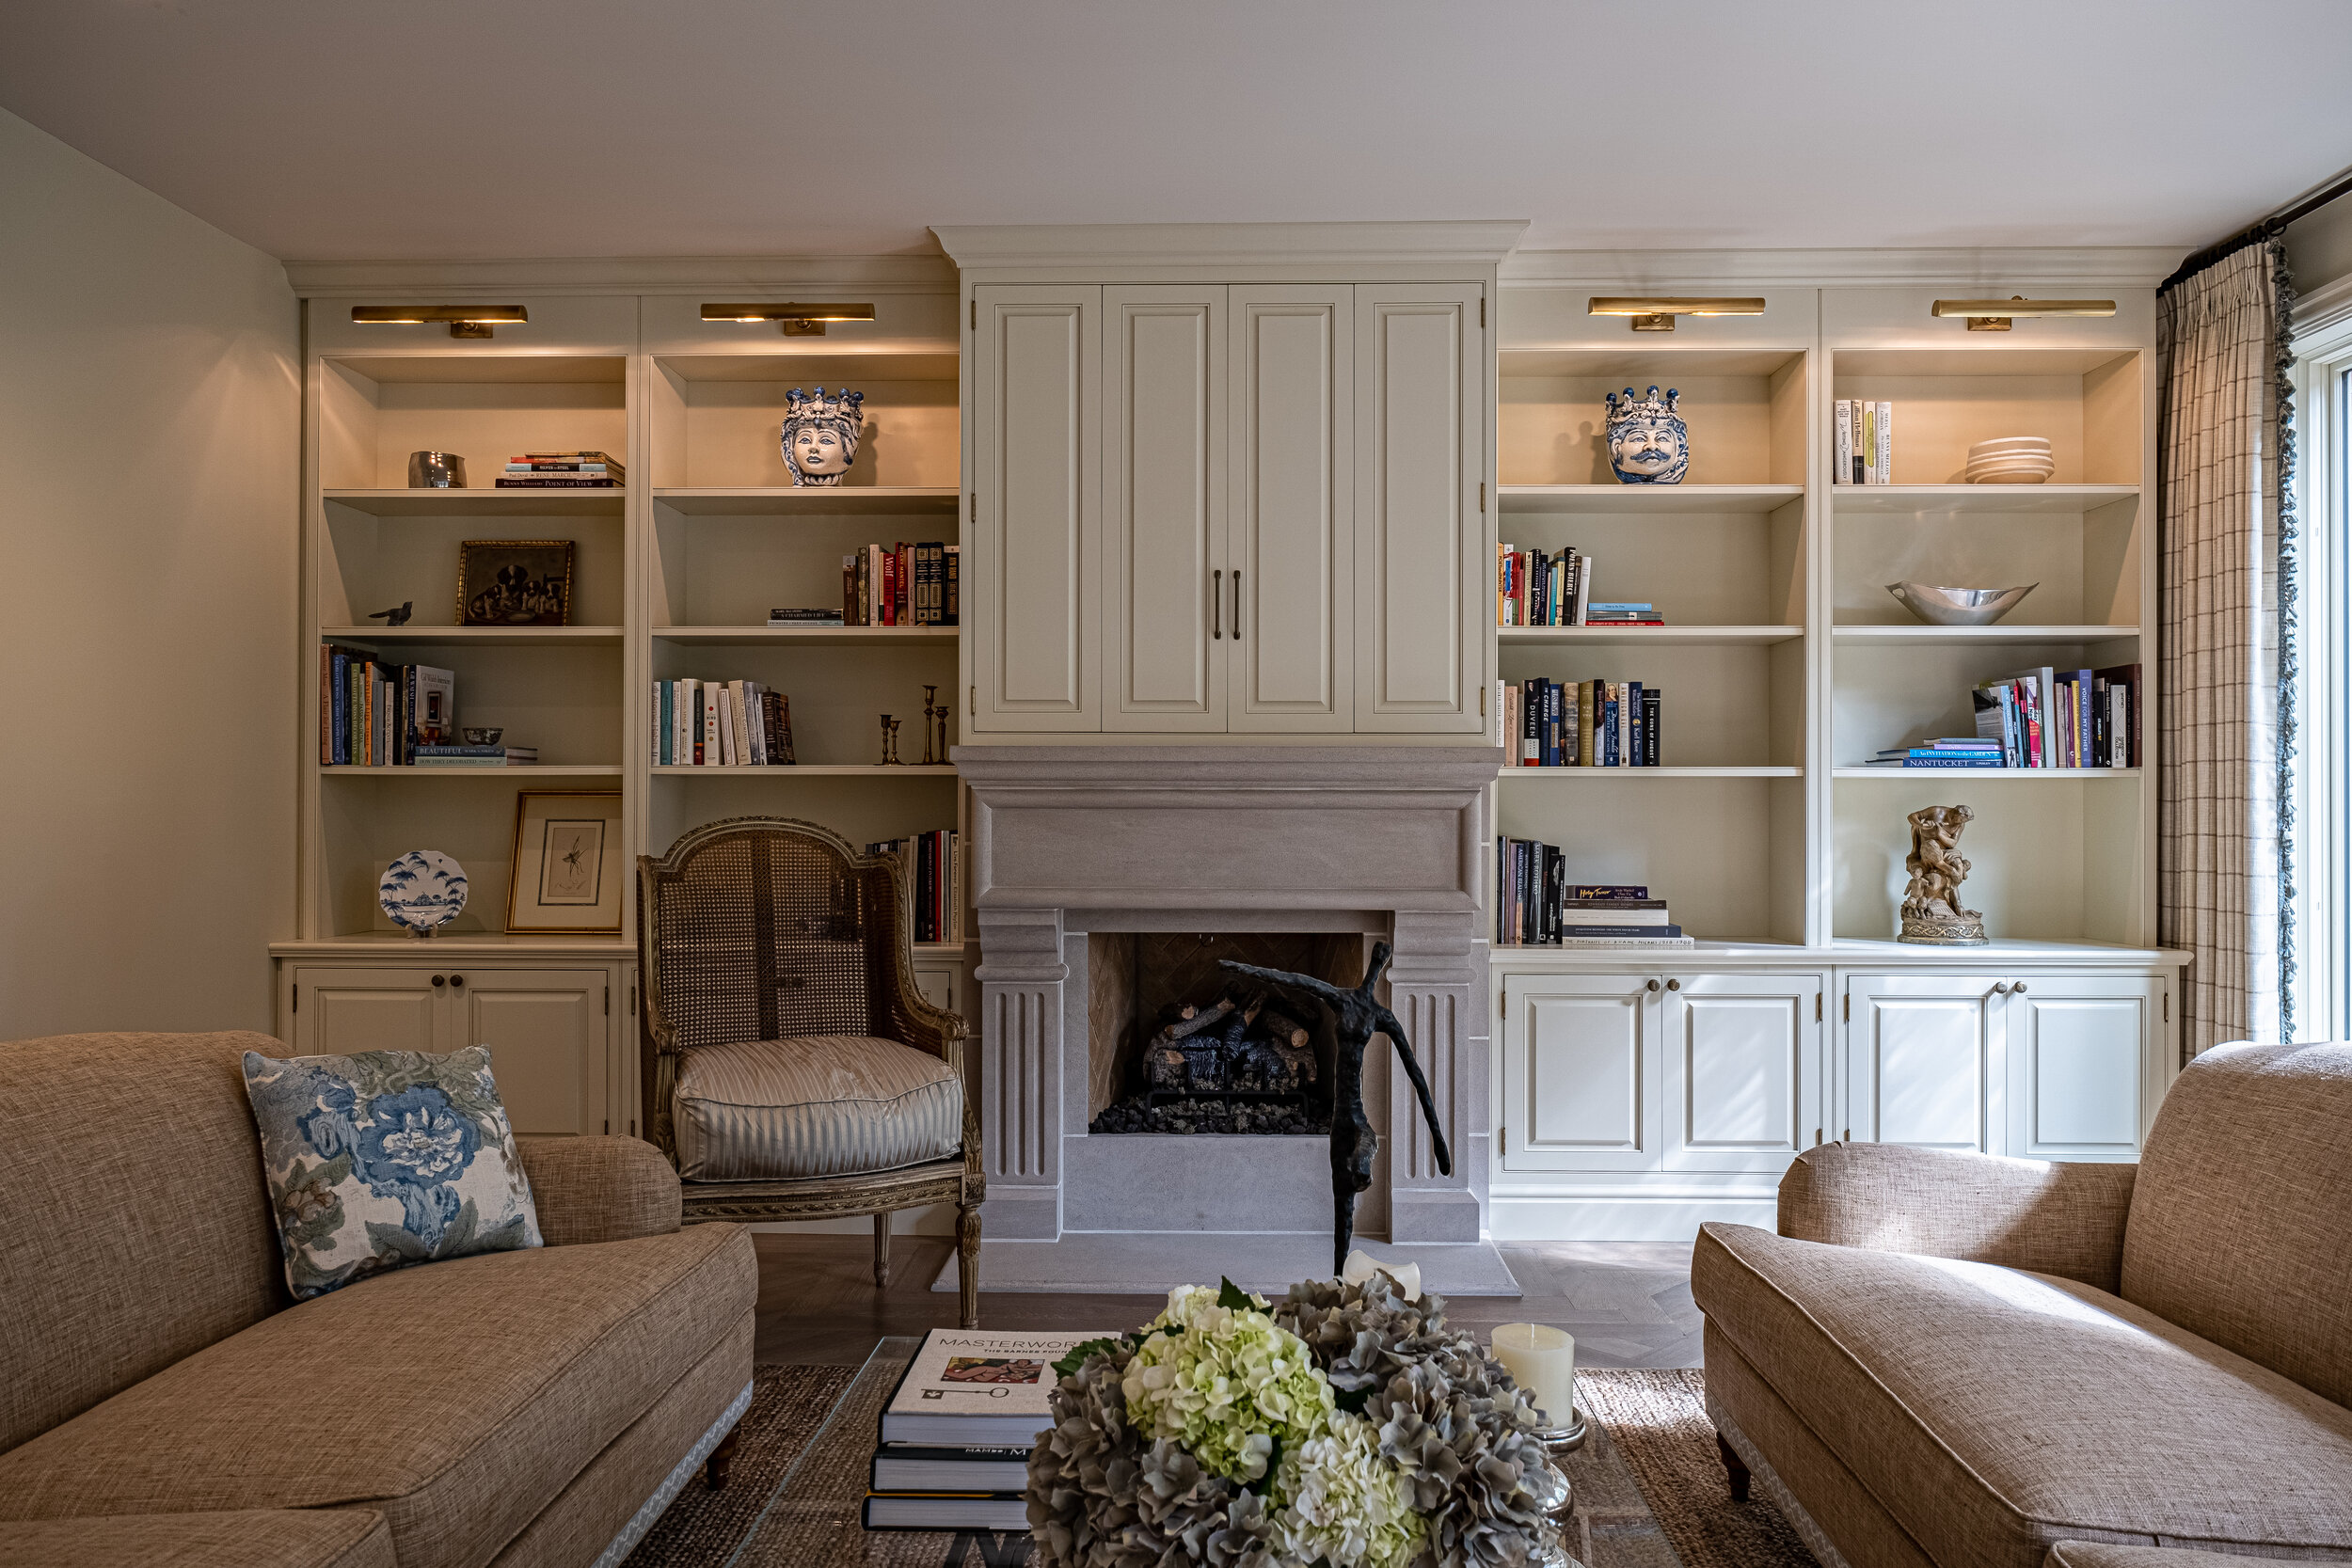 M Ferrari Company, Living Room Bookcases & Built-In